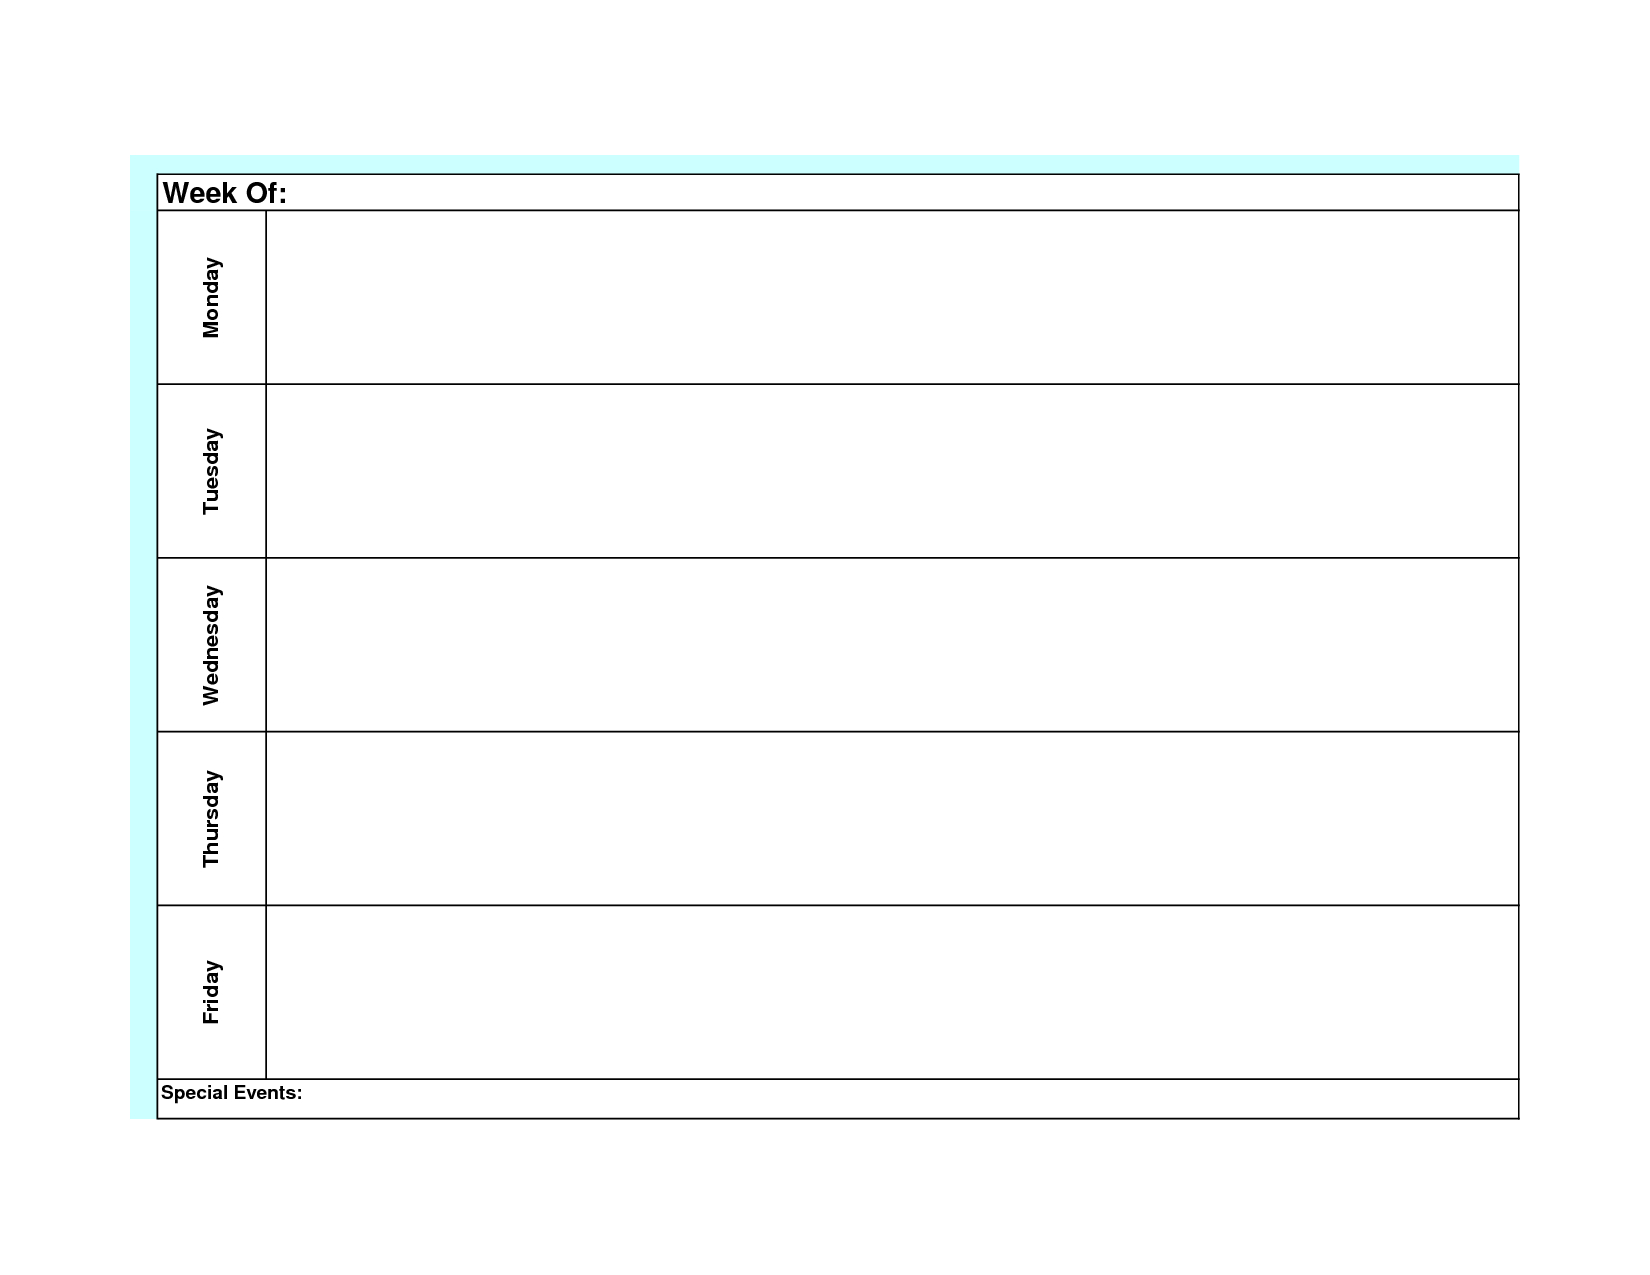 Blank Weekly Calendar Template Monday Friday (With Images Weekly Calendar Template Monday To Friday